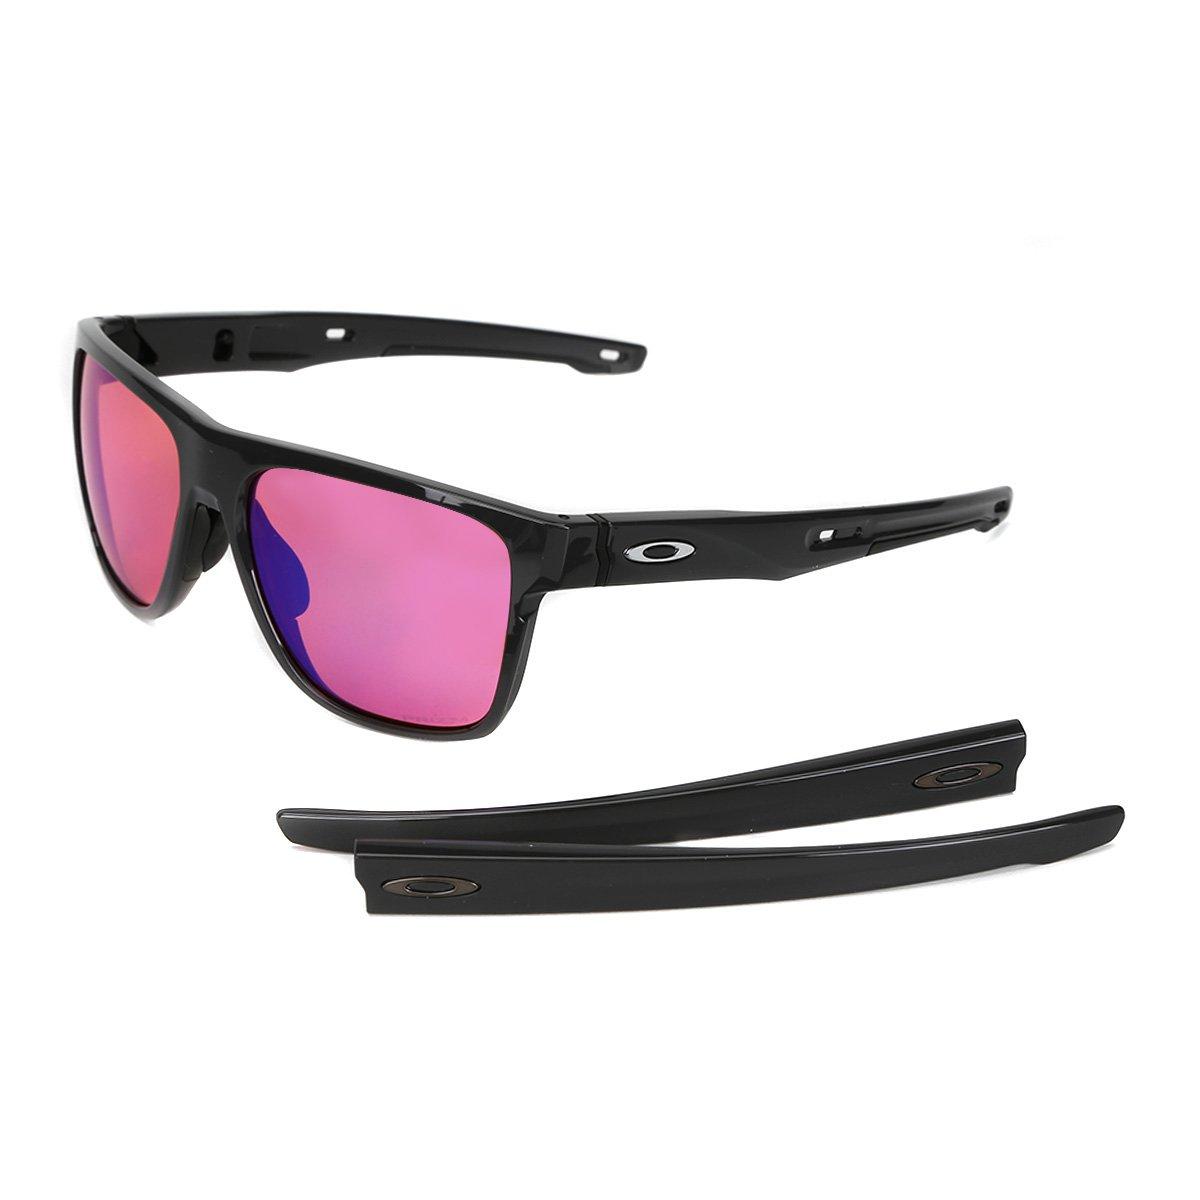 59657e2347ffa Óculos de Sol Oakley Crossrange Xl Masculino - Compre Agora